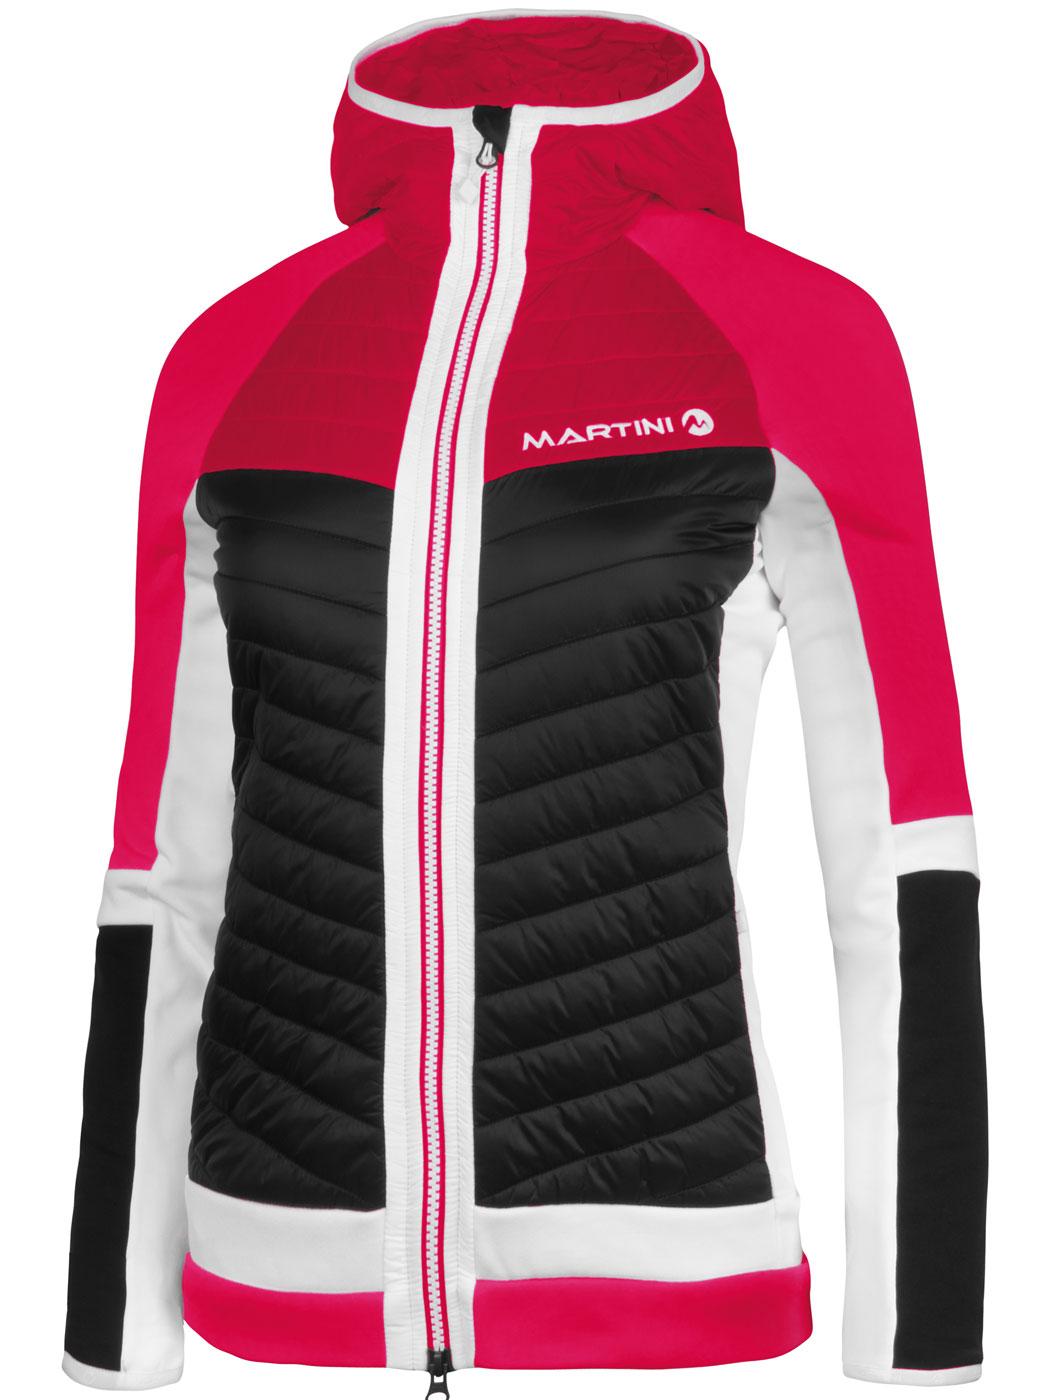 MARTINI Accelerate Jacke W online kaufen   Nordic 24